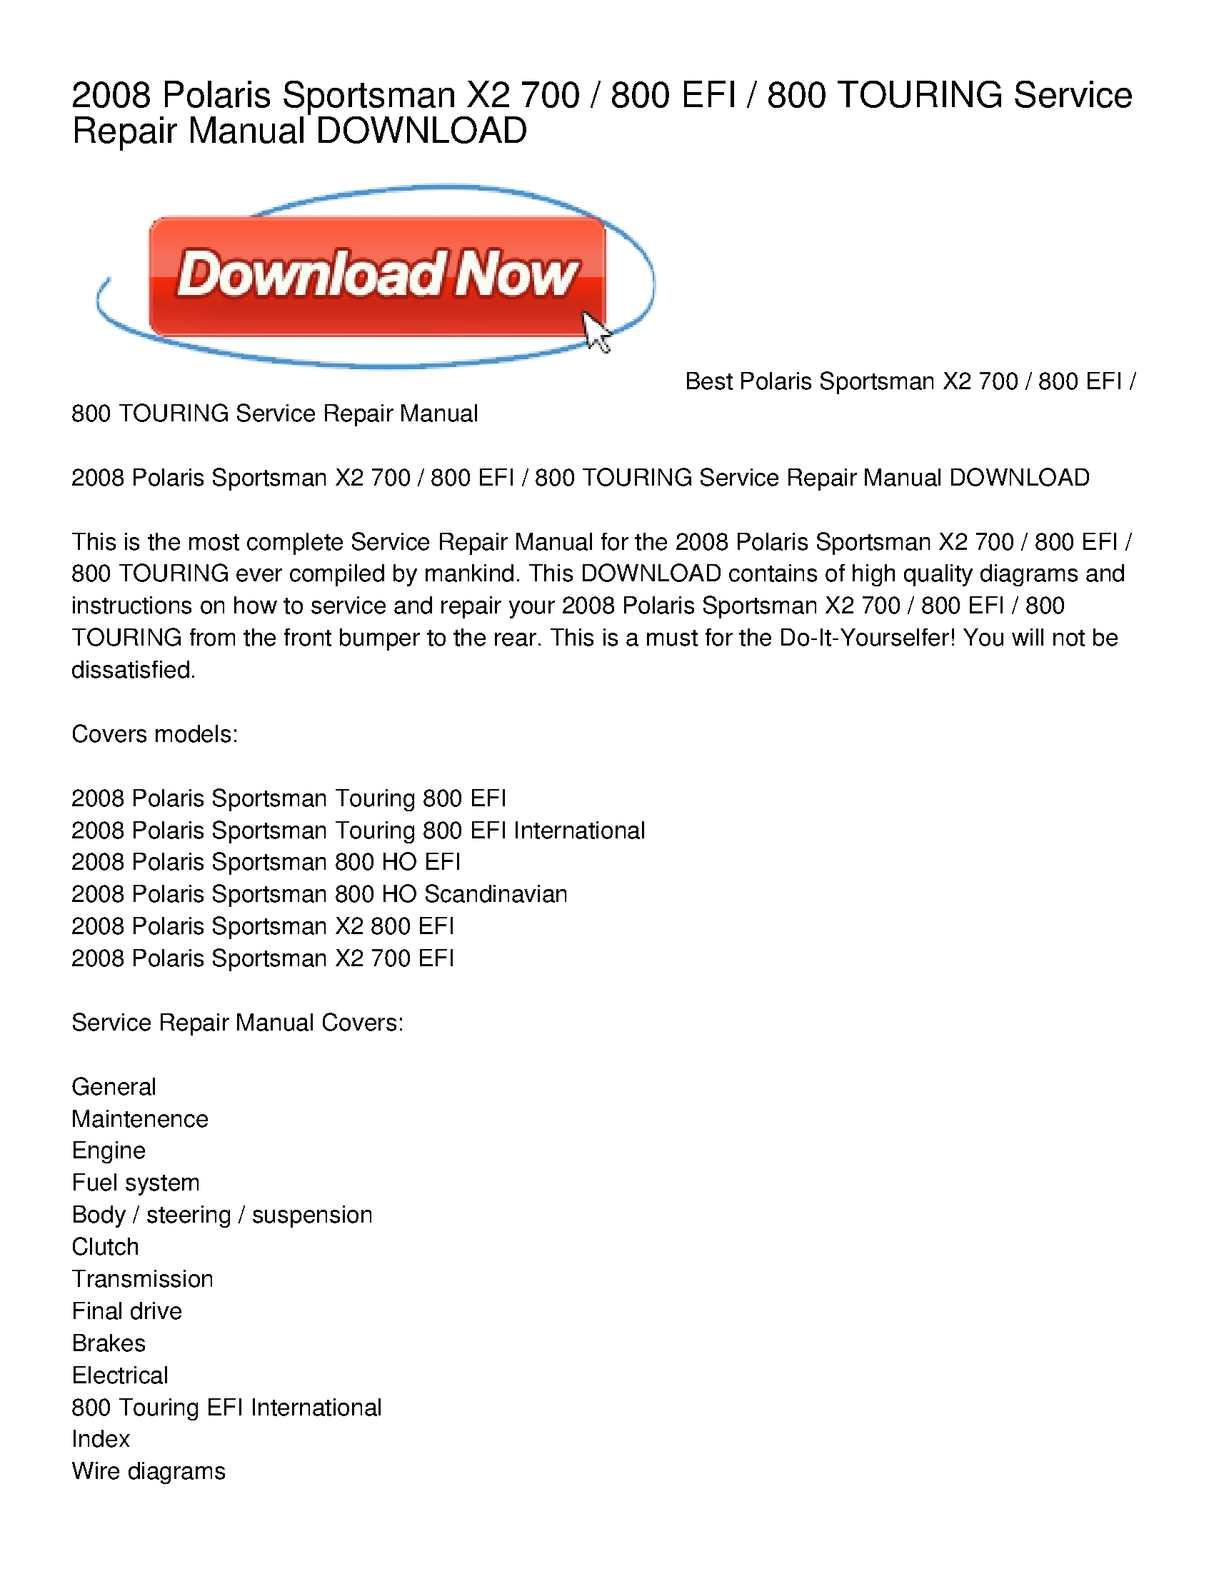 2008 polaris sportsman x2 700 _ 800 efi _ 800 touring service repair manual  download